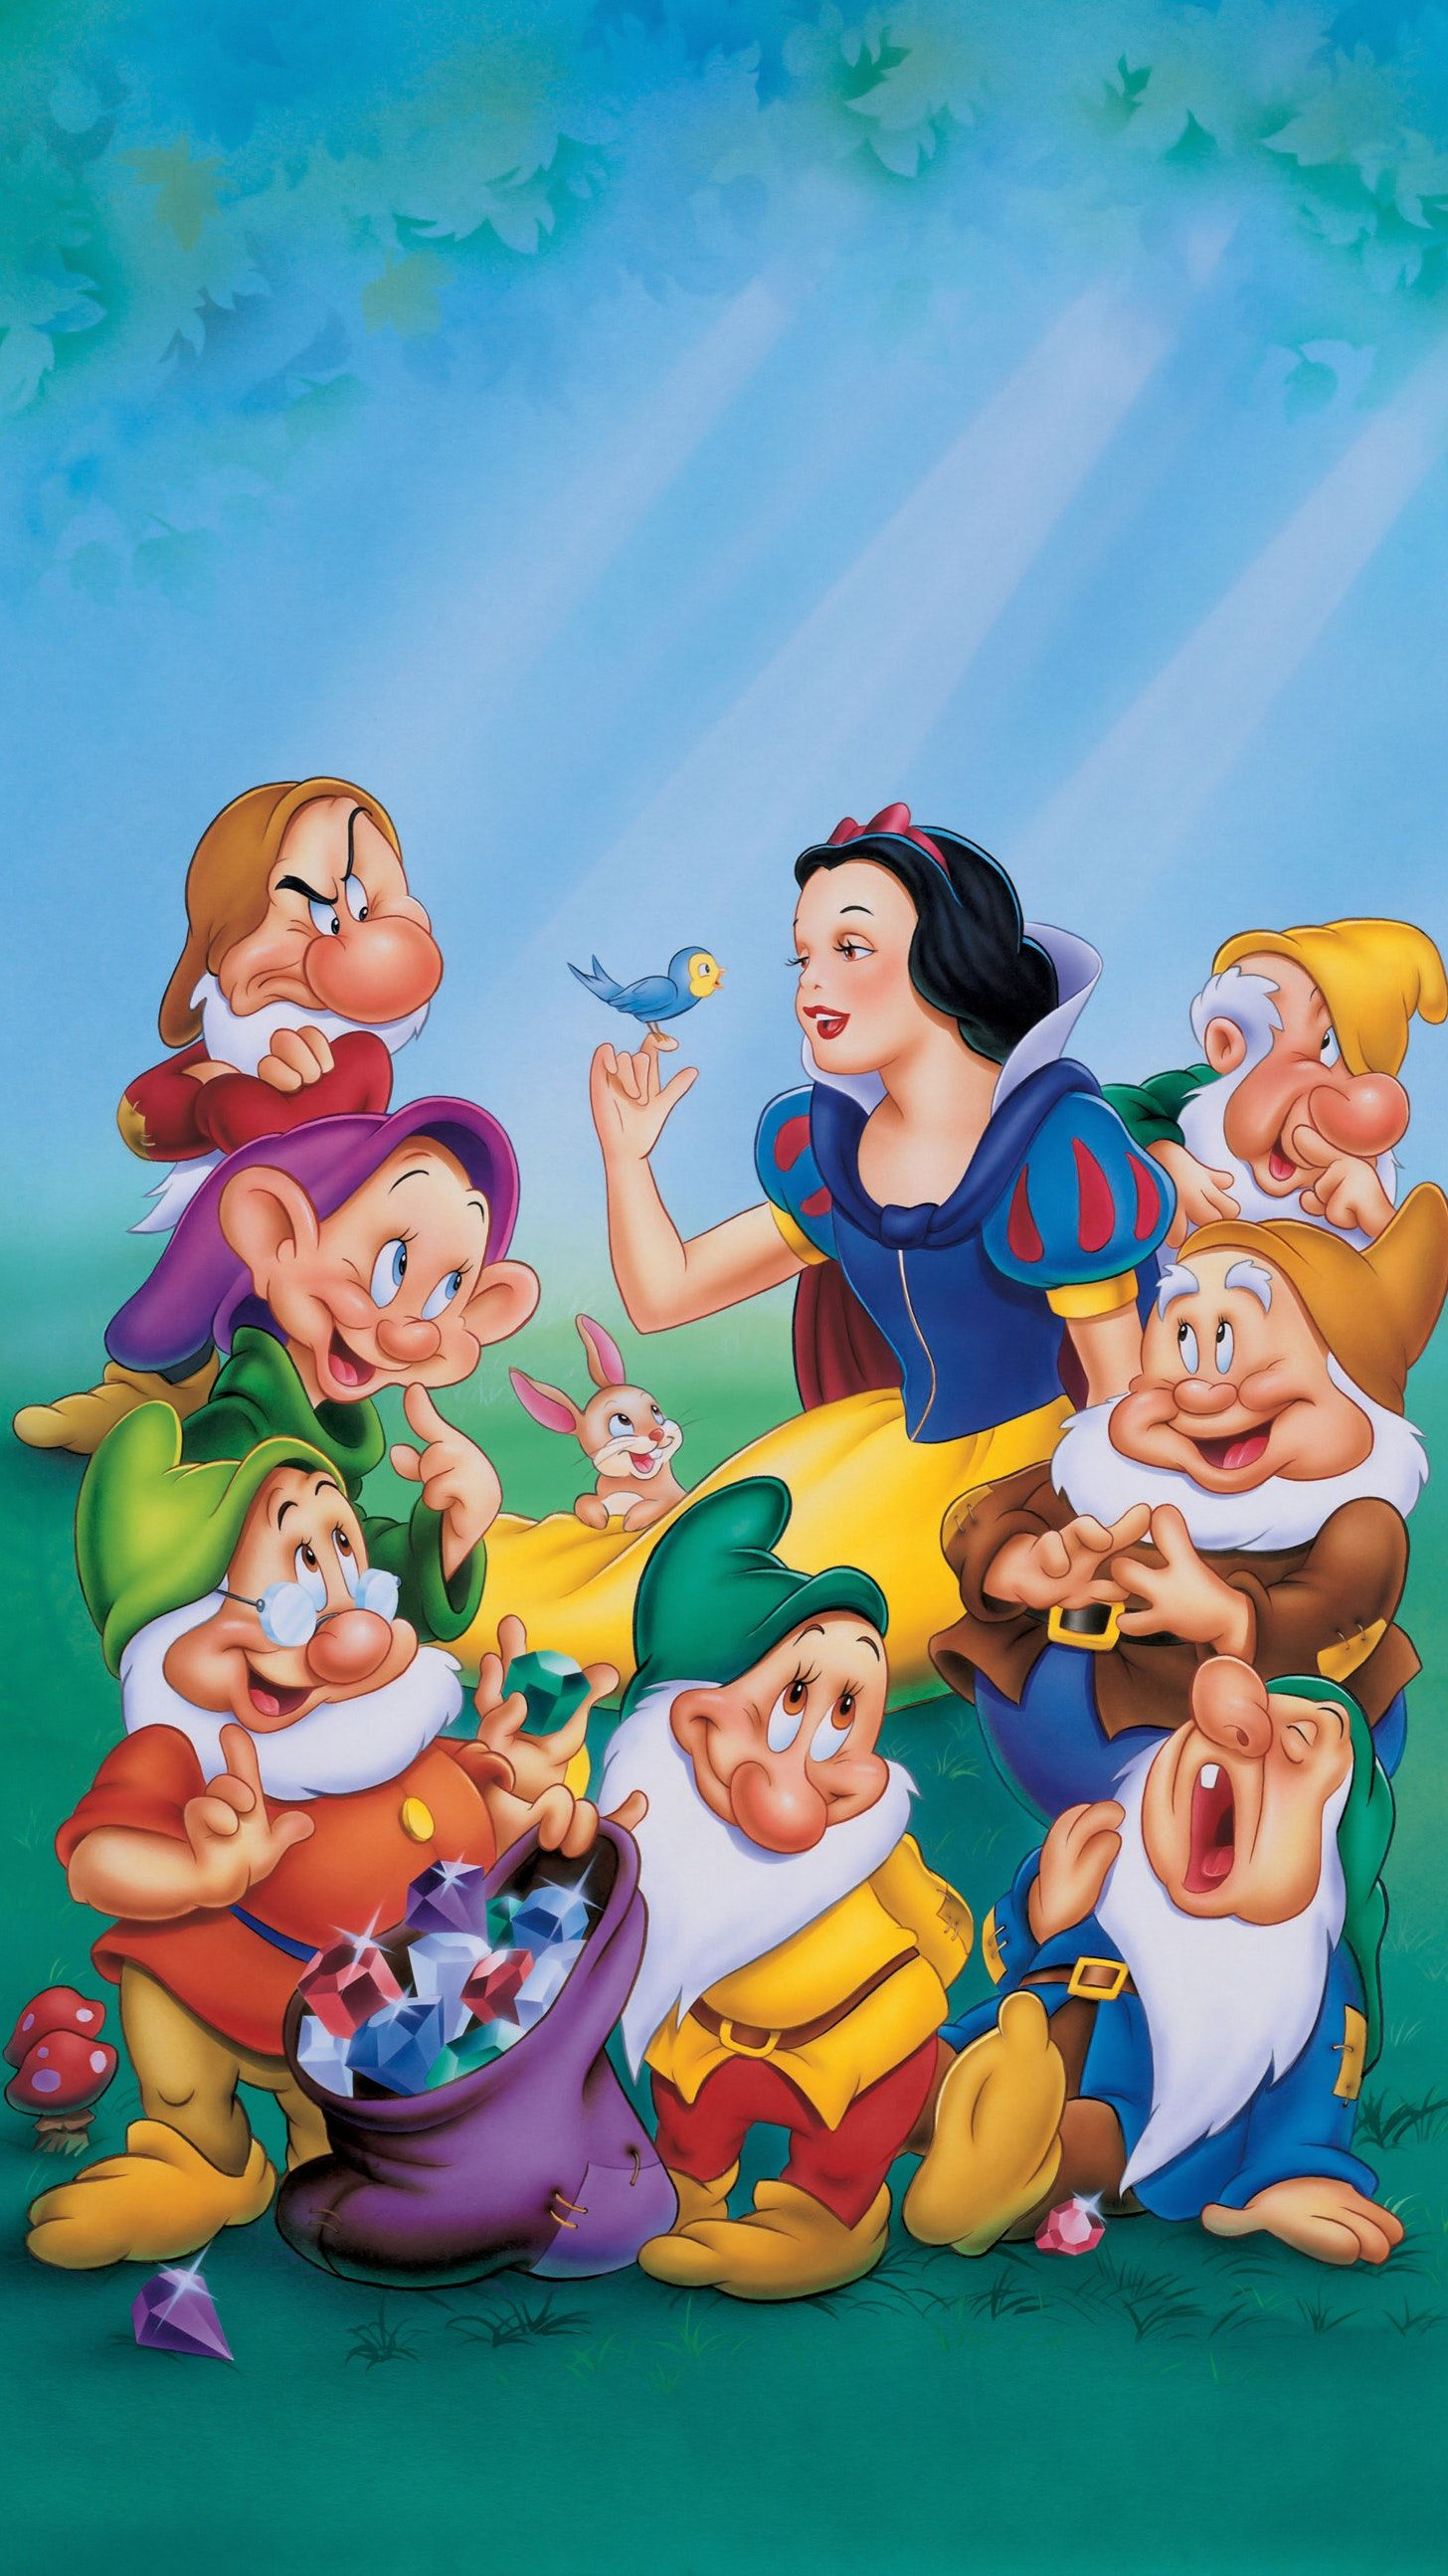 Snow White And The Seven Dwarfs 1937 Phone Wallpaper Moviemania Disney Princess Snow White Snow White Disney Snow White Wallpaper